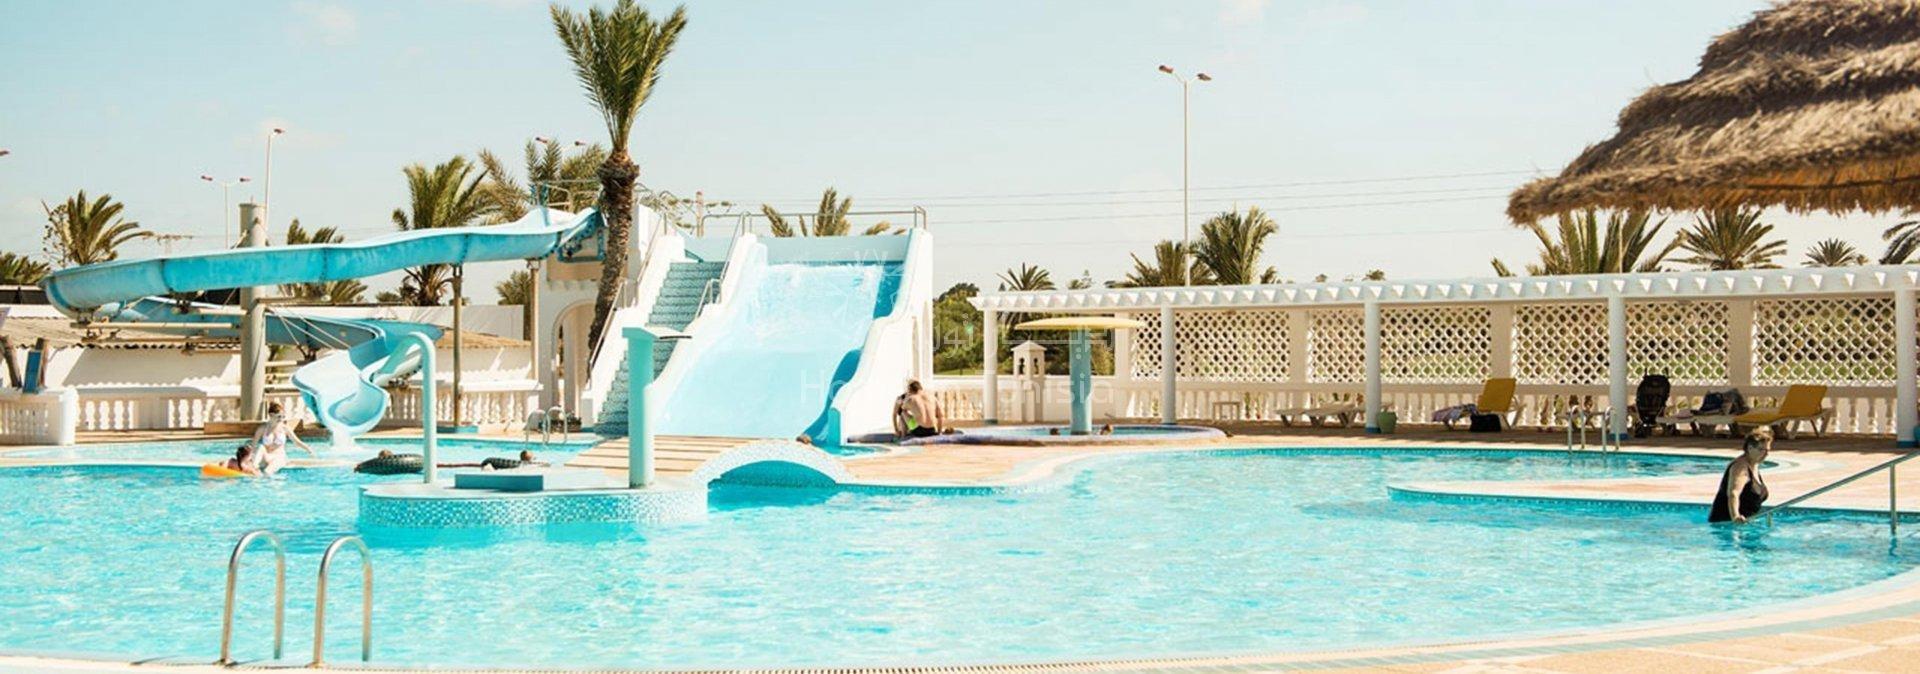 Location Hôtel - Midoun - Tunisie